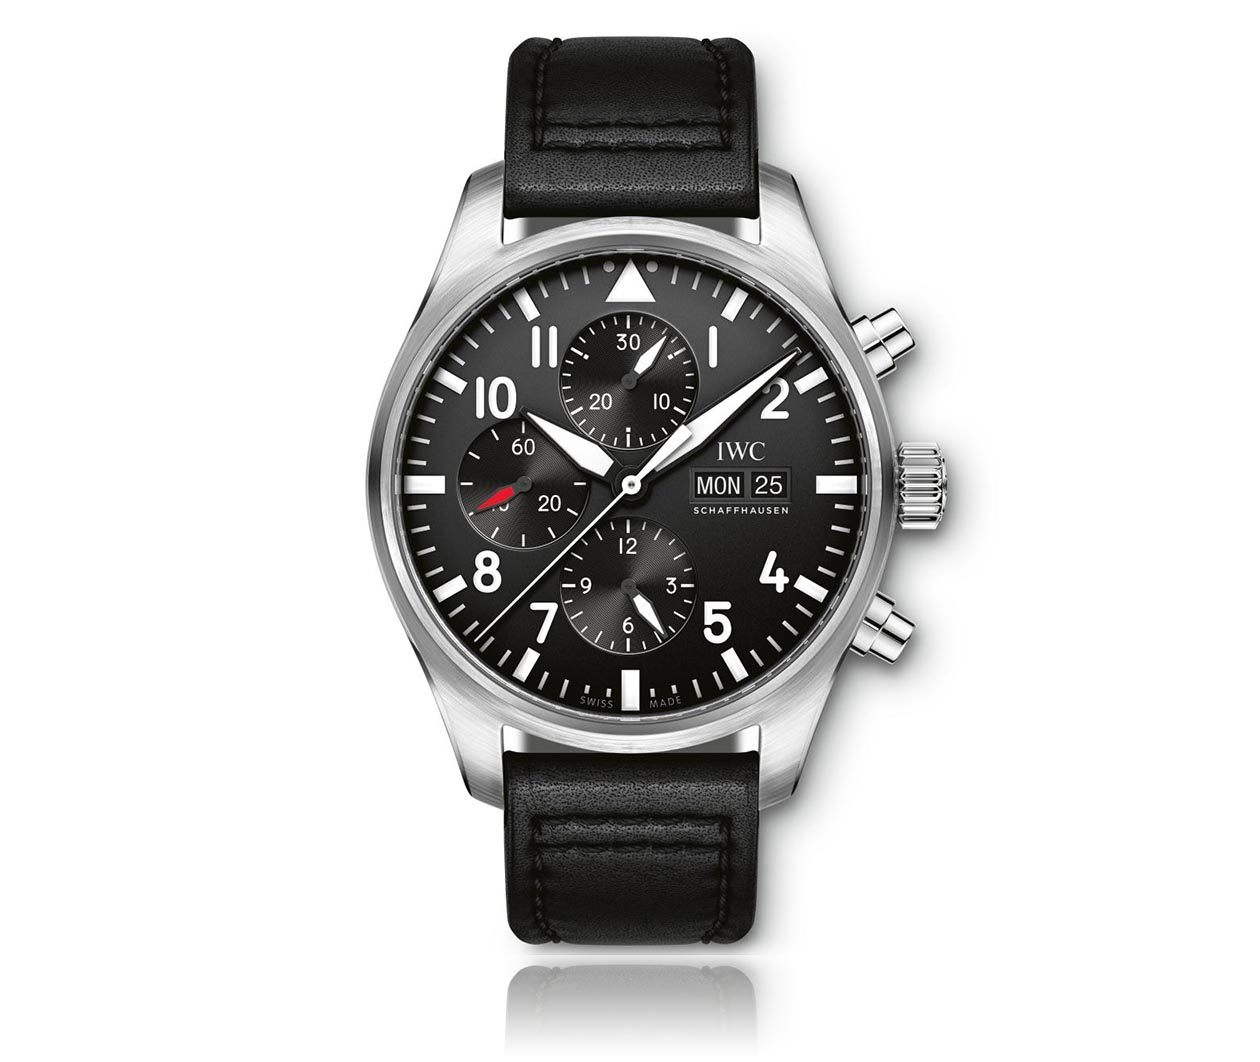 IWC PilotsWatch Chronograph IW377709 Flatlay FINAL